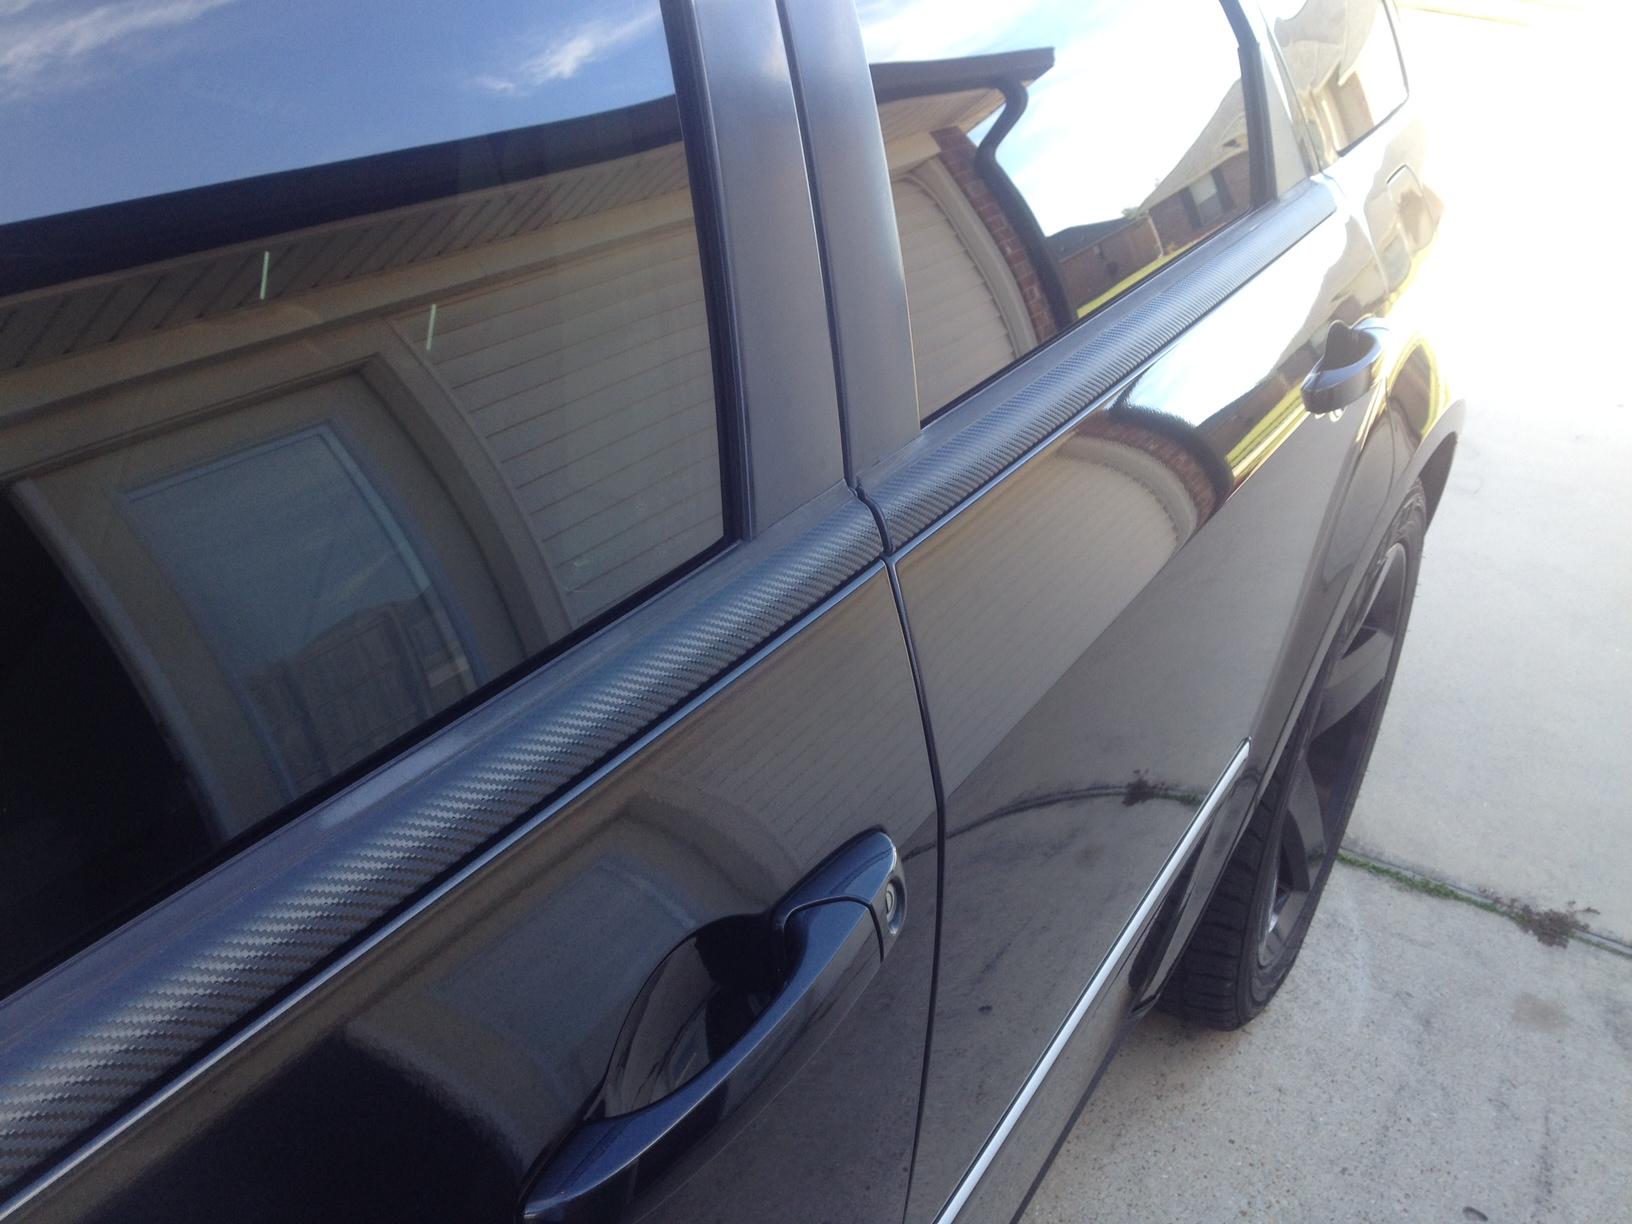 Vinyl window trim molding - Vinyl Window Trim Molding 49